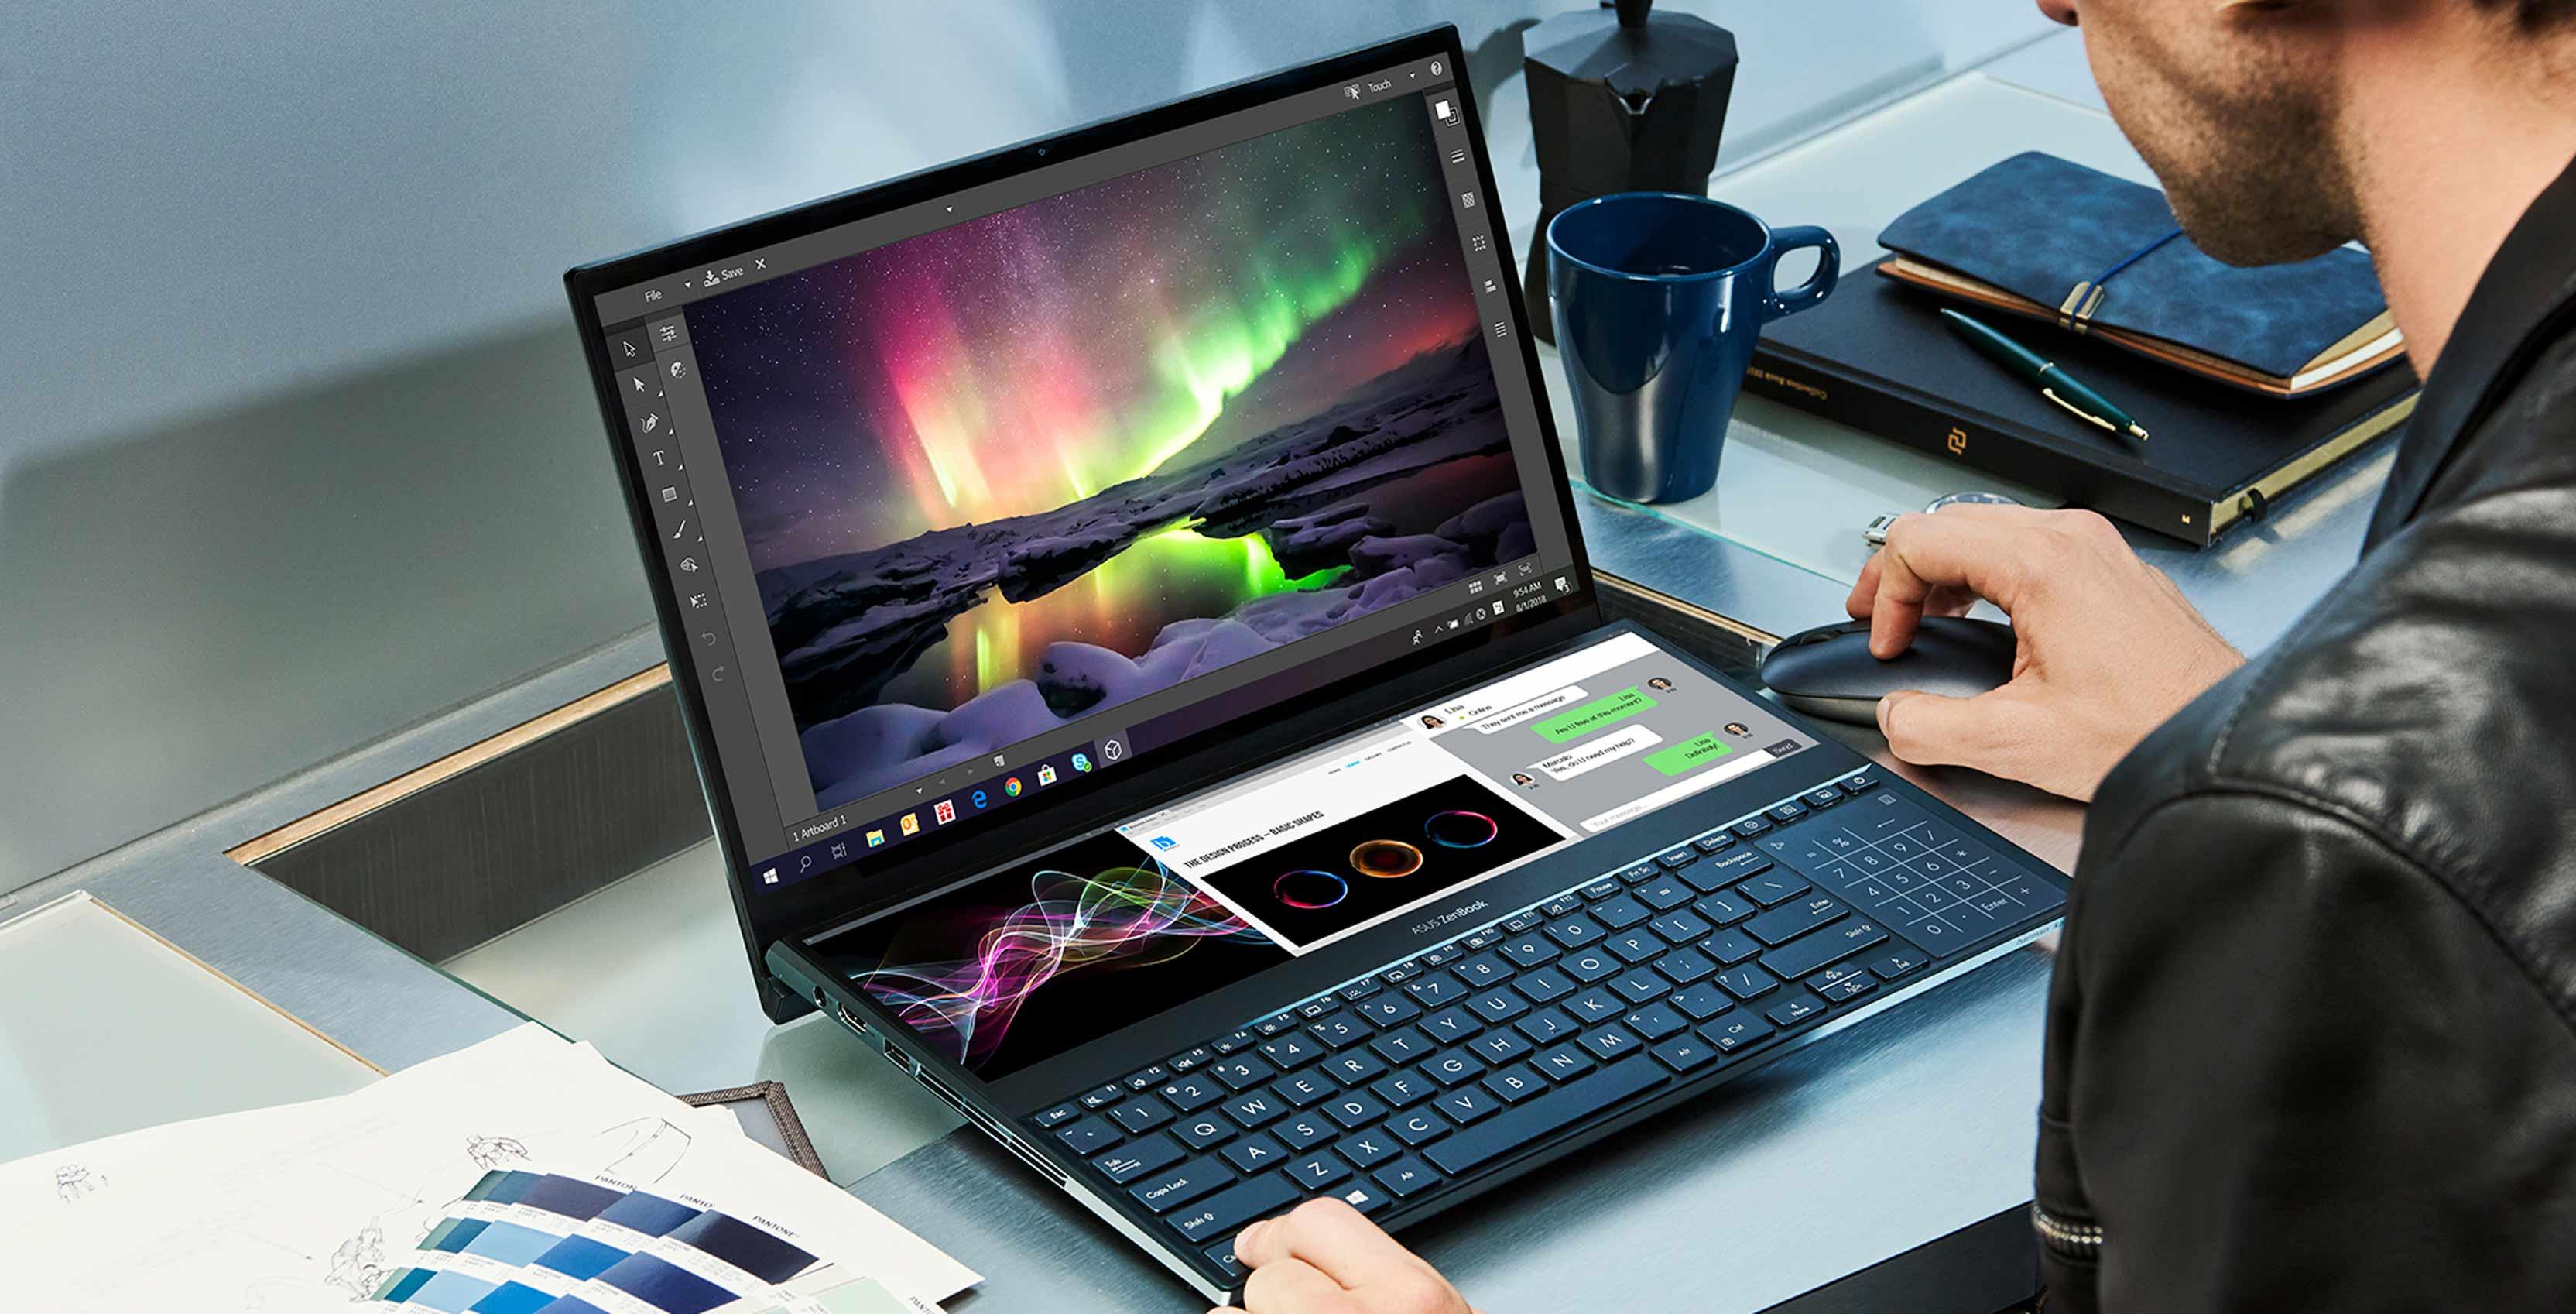 The Asus ZenBook Pro Duo